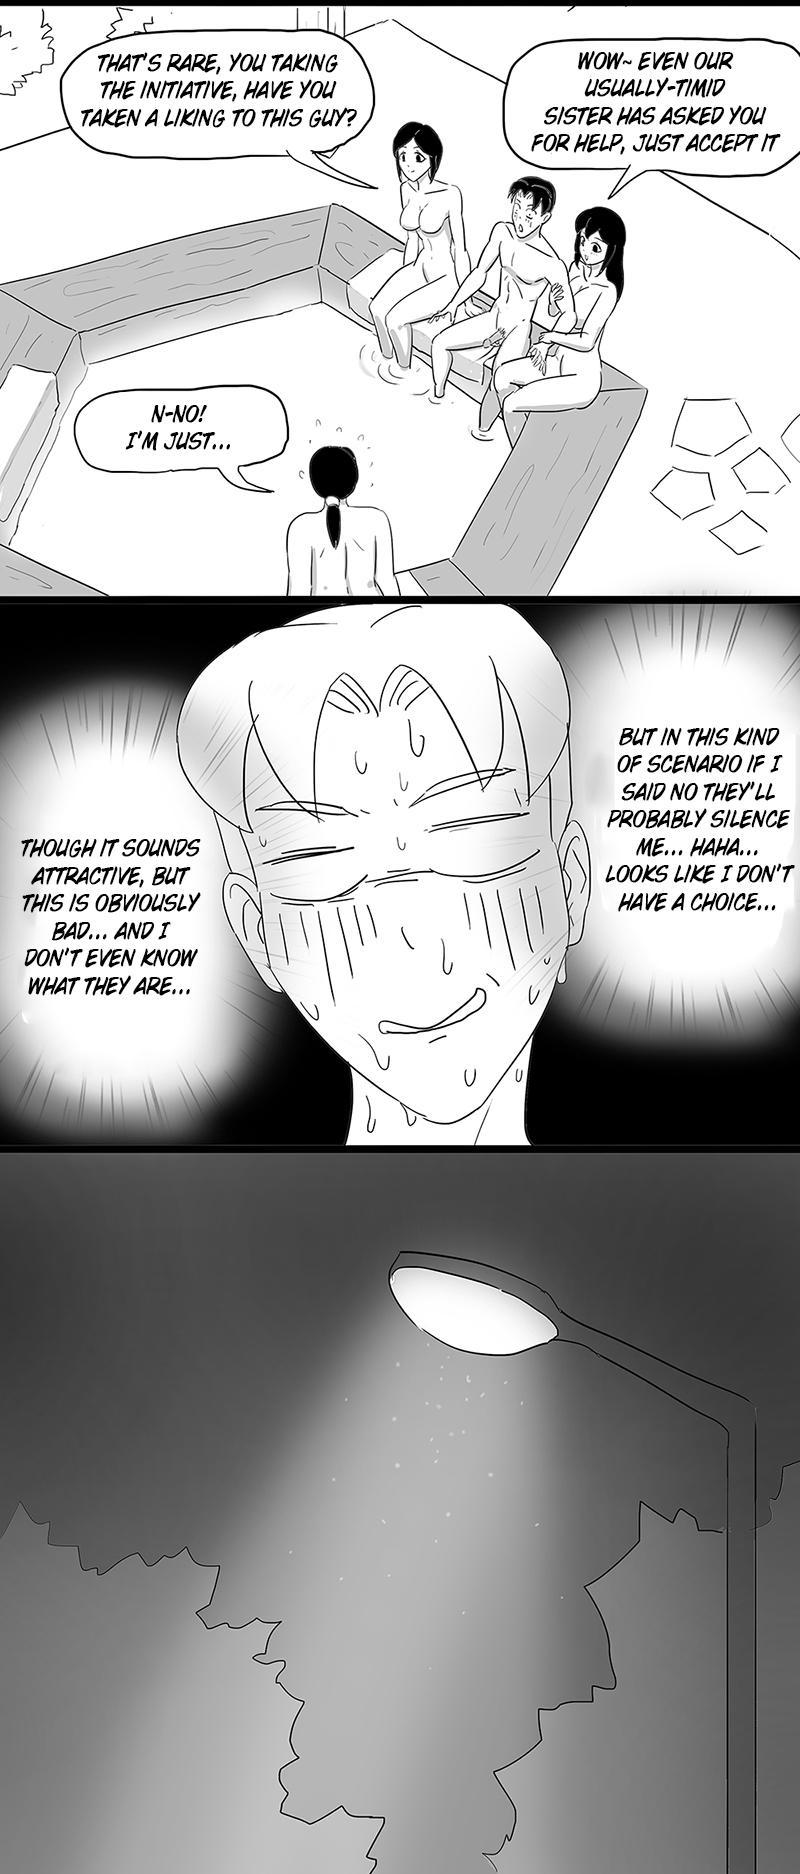 [skyzen] 寄生虫系列 [English] [xinsu] pg. 1-48 57